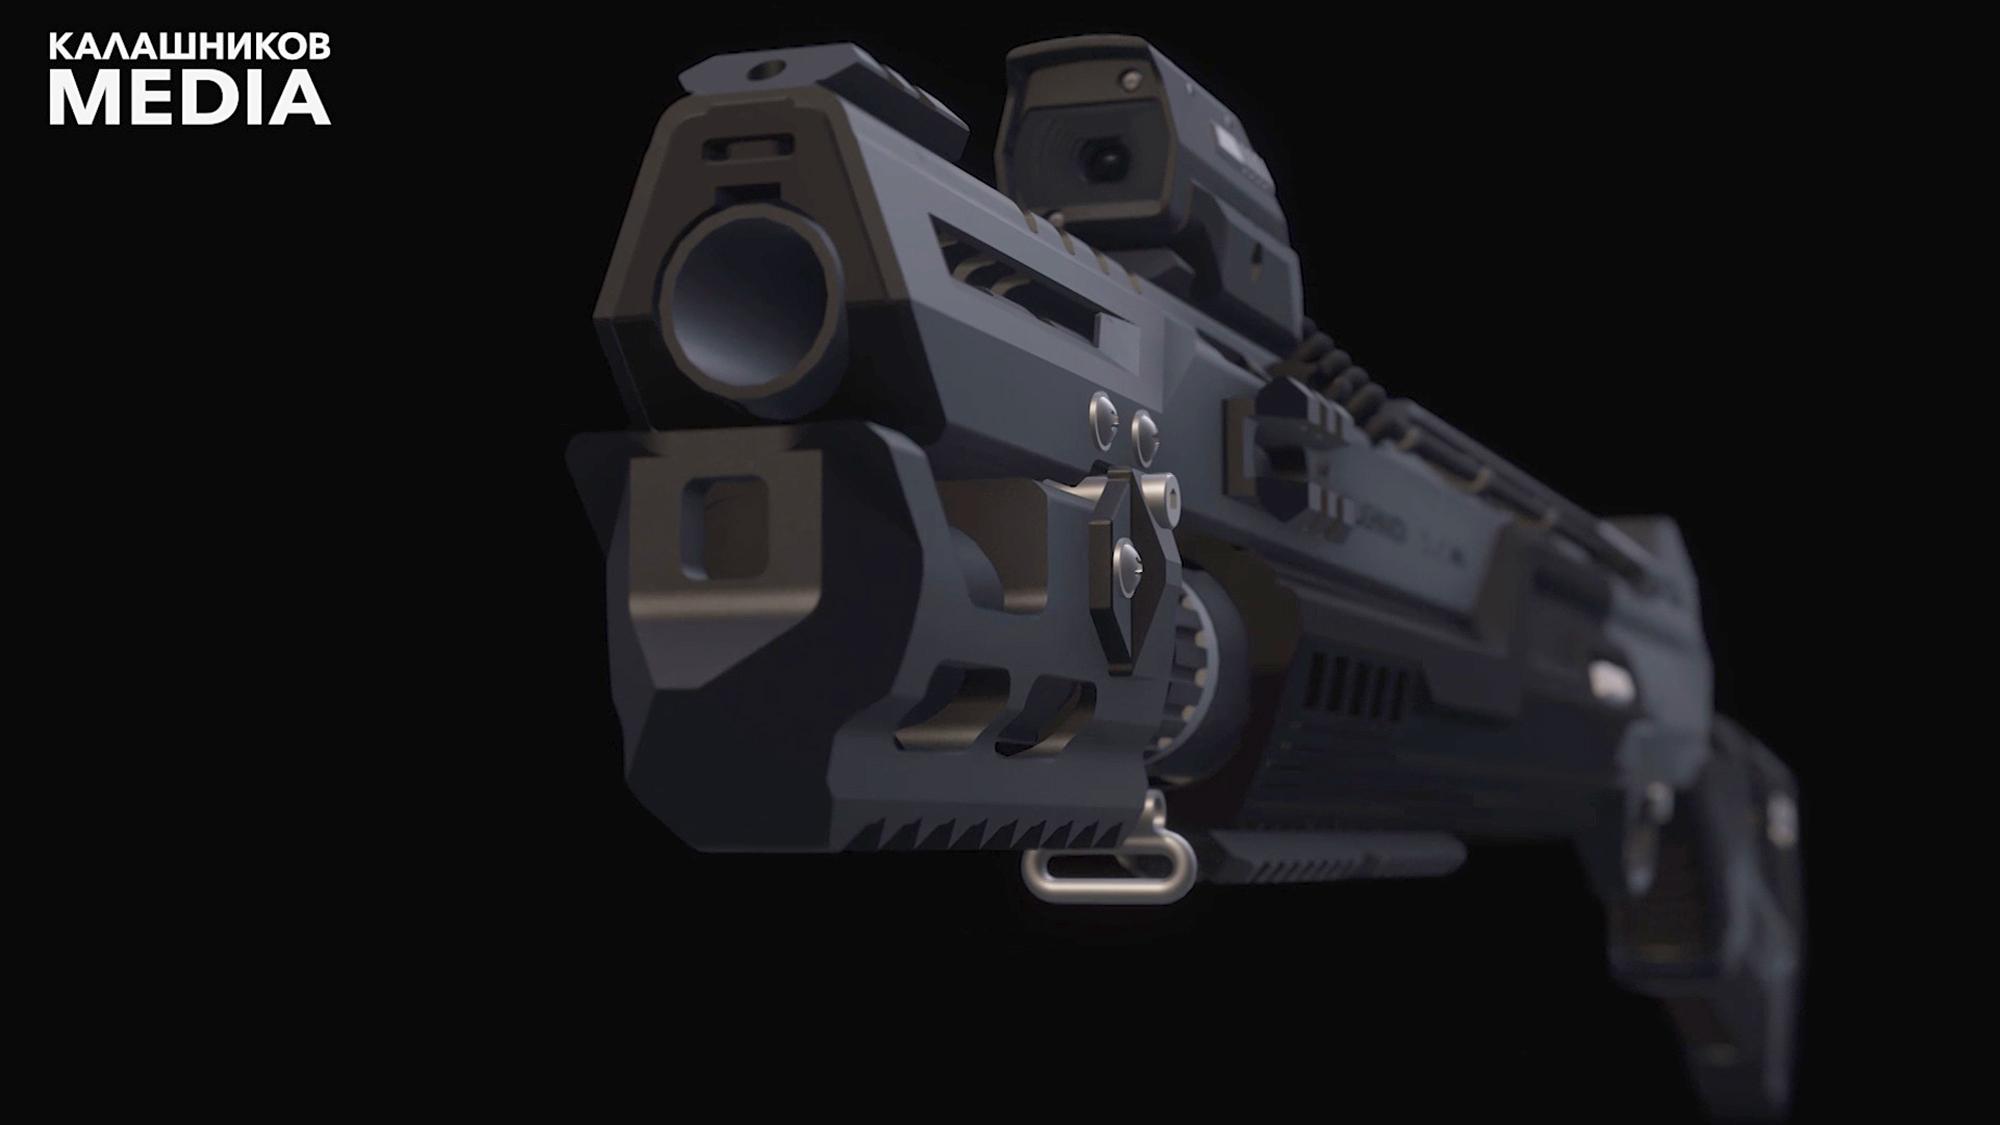 VIDEO: Shooting From The Hipster: Kalashnikov Exports The First Smart Shotgun